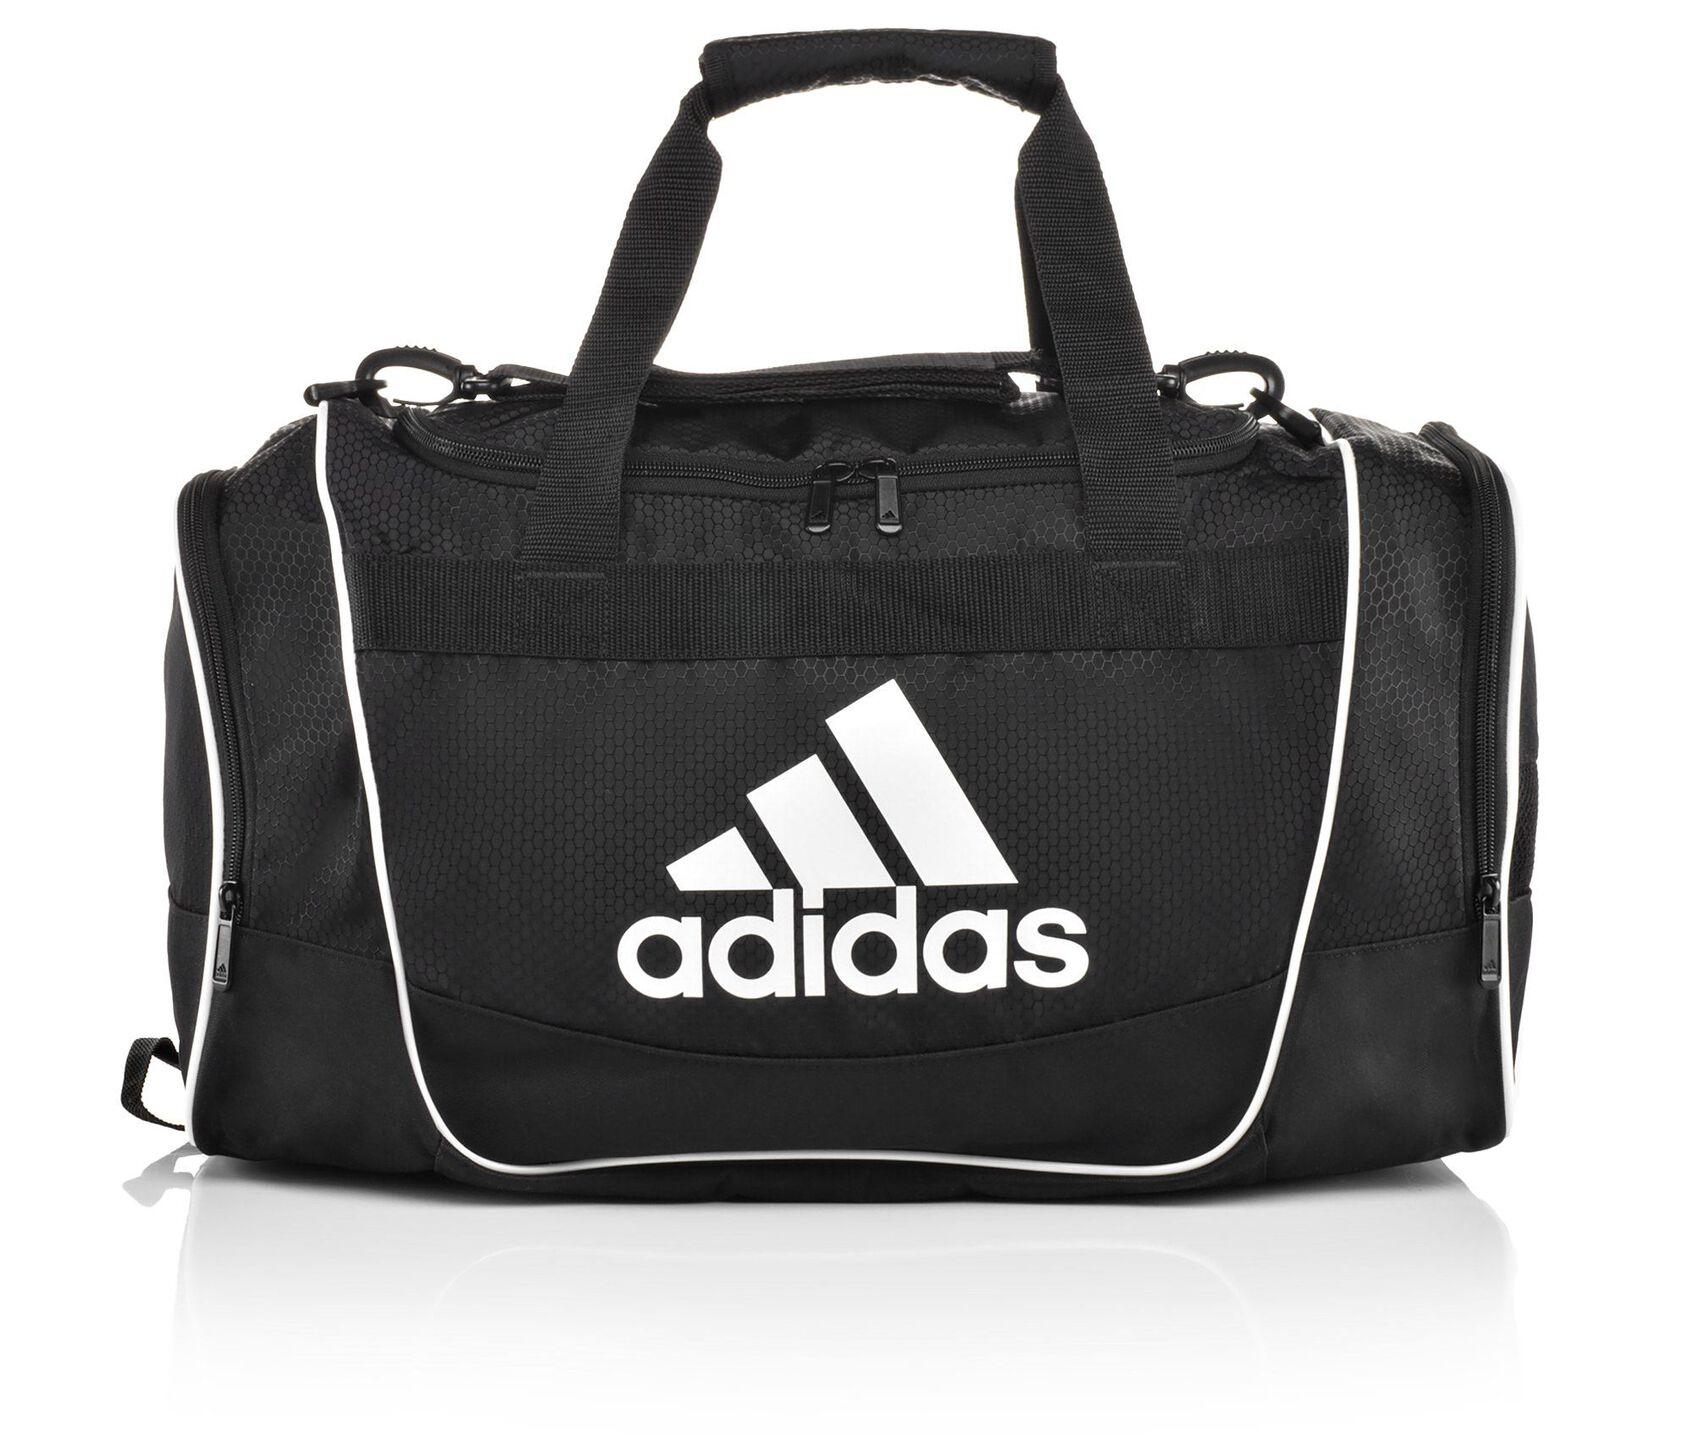 bfa20c0804ba Adidas Defender Small Duffel Bag. Previous